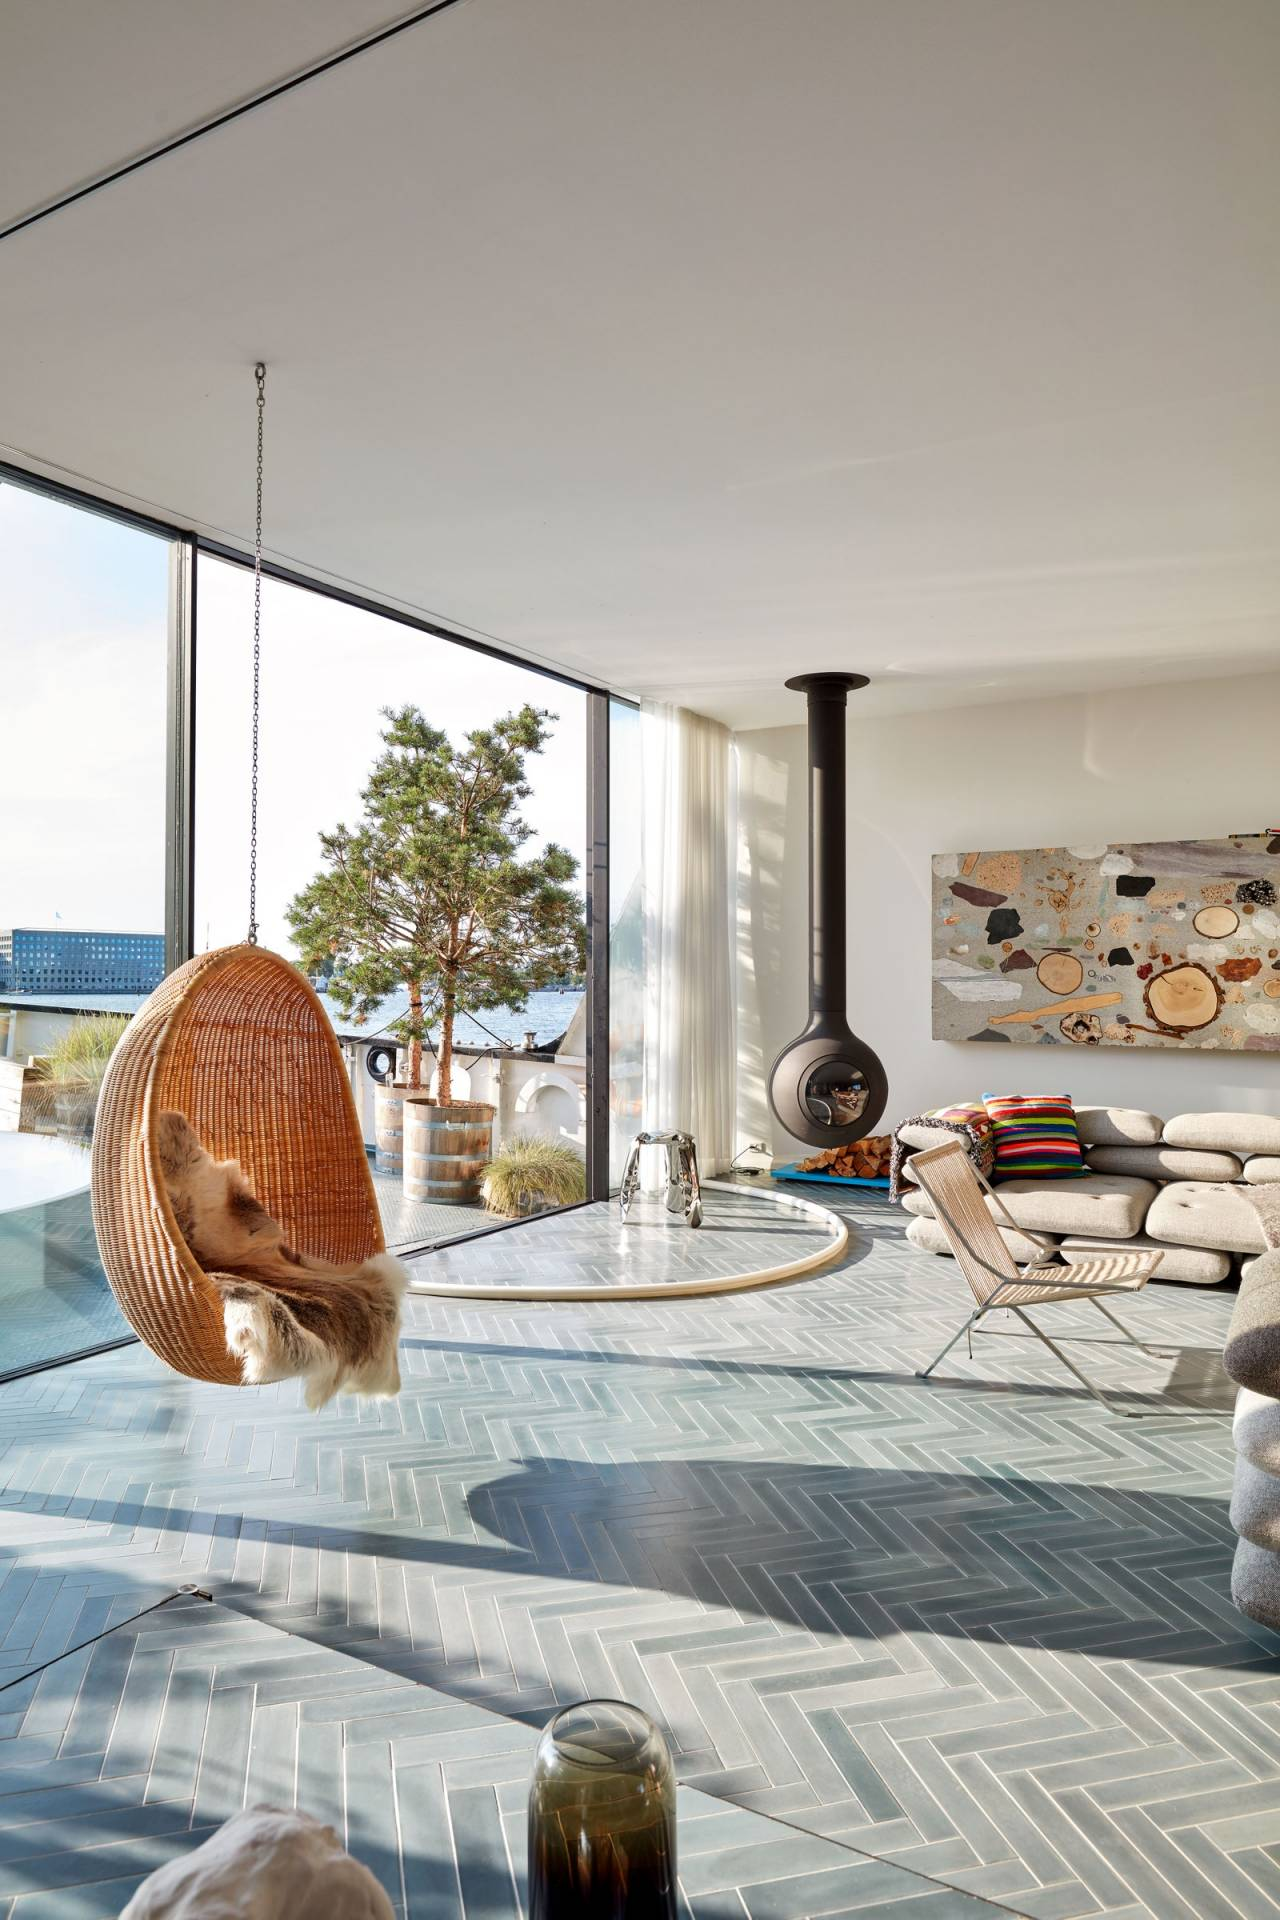 bjarke_ingels_houseboat_foto_pernille_loof_and_thomas_loof_designalive-14